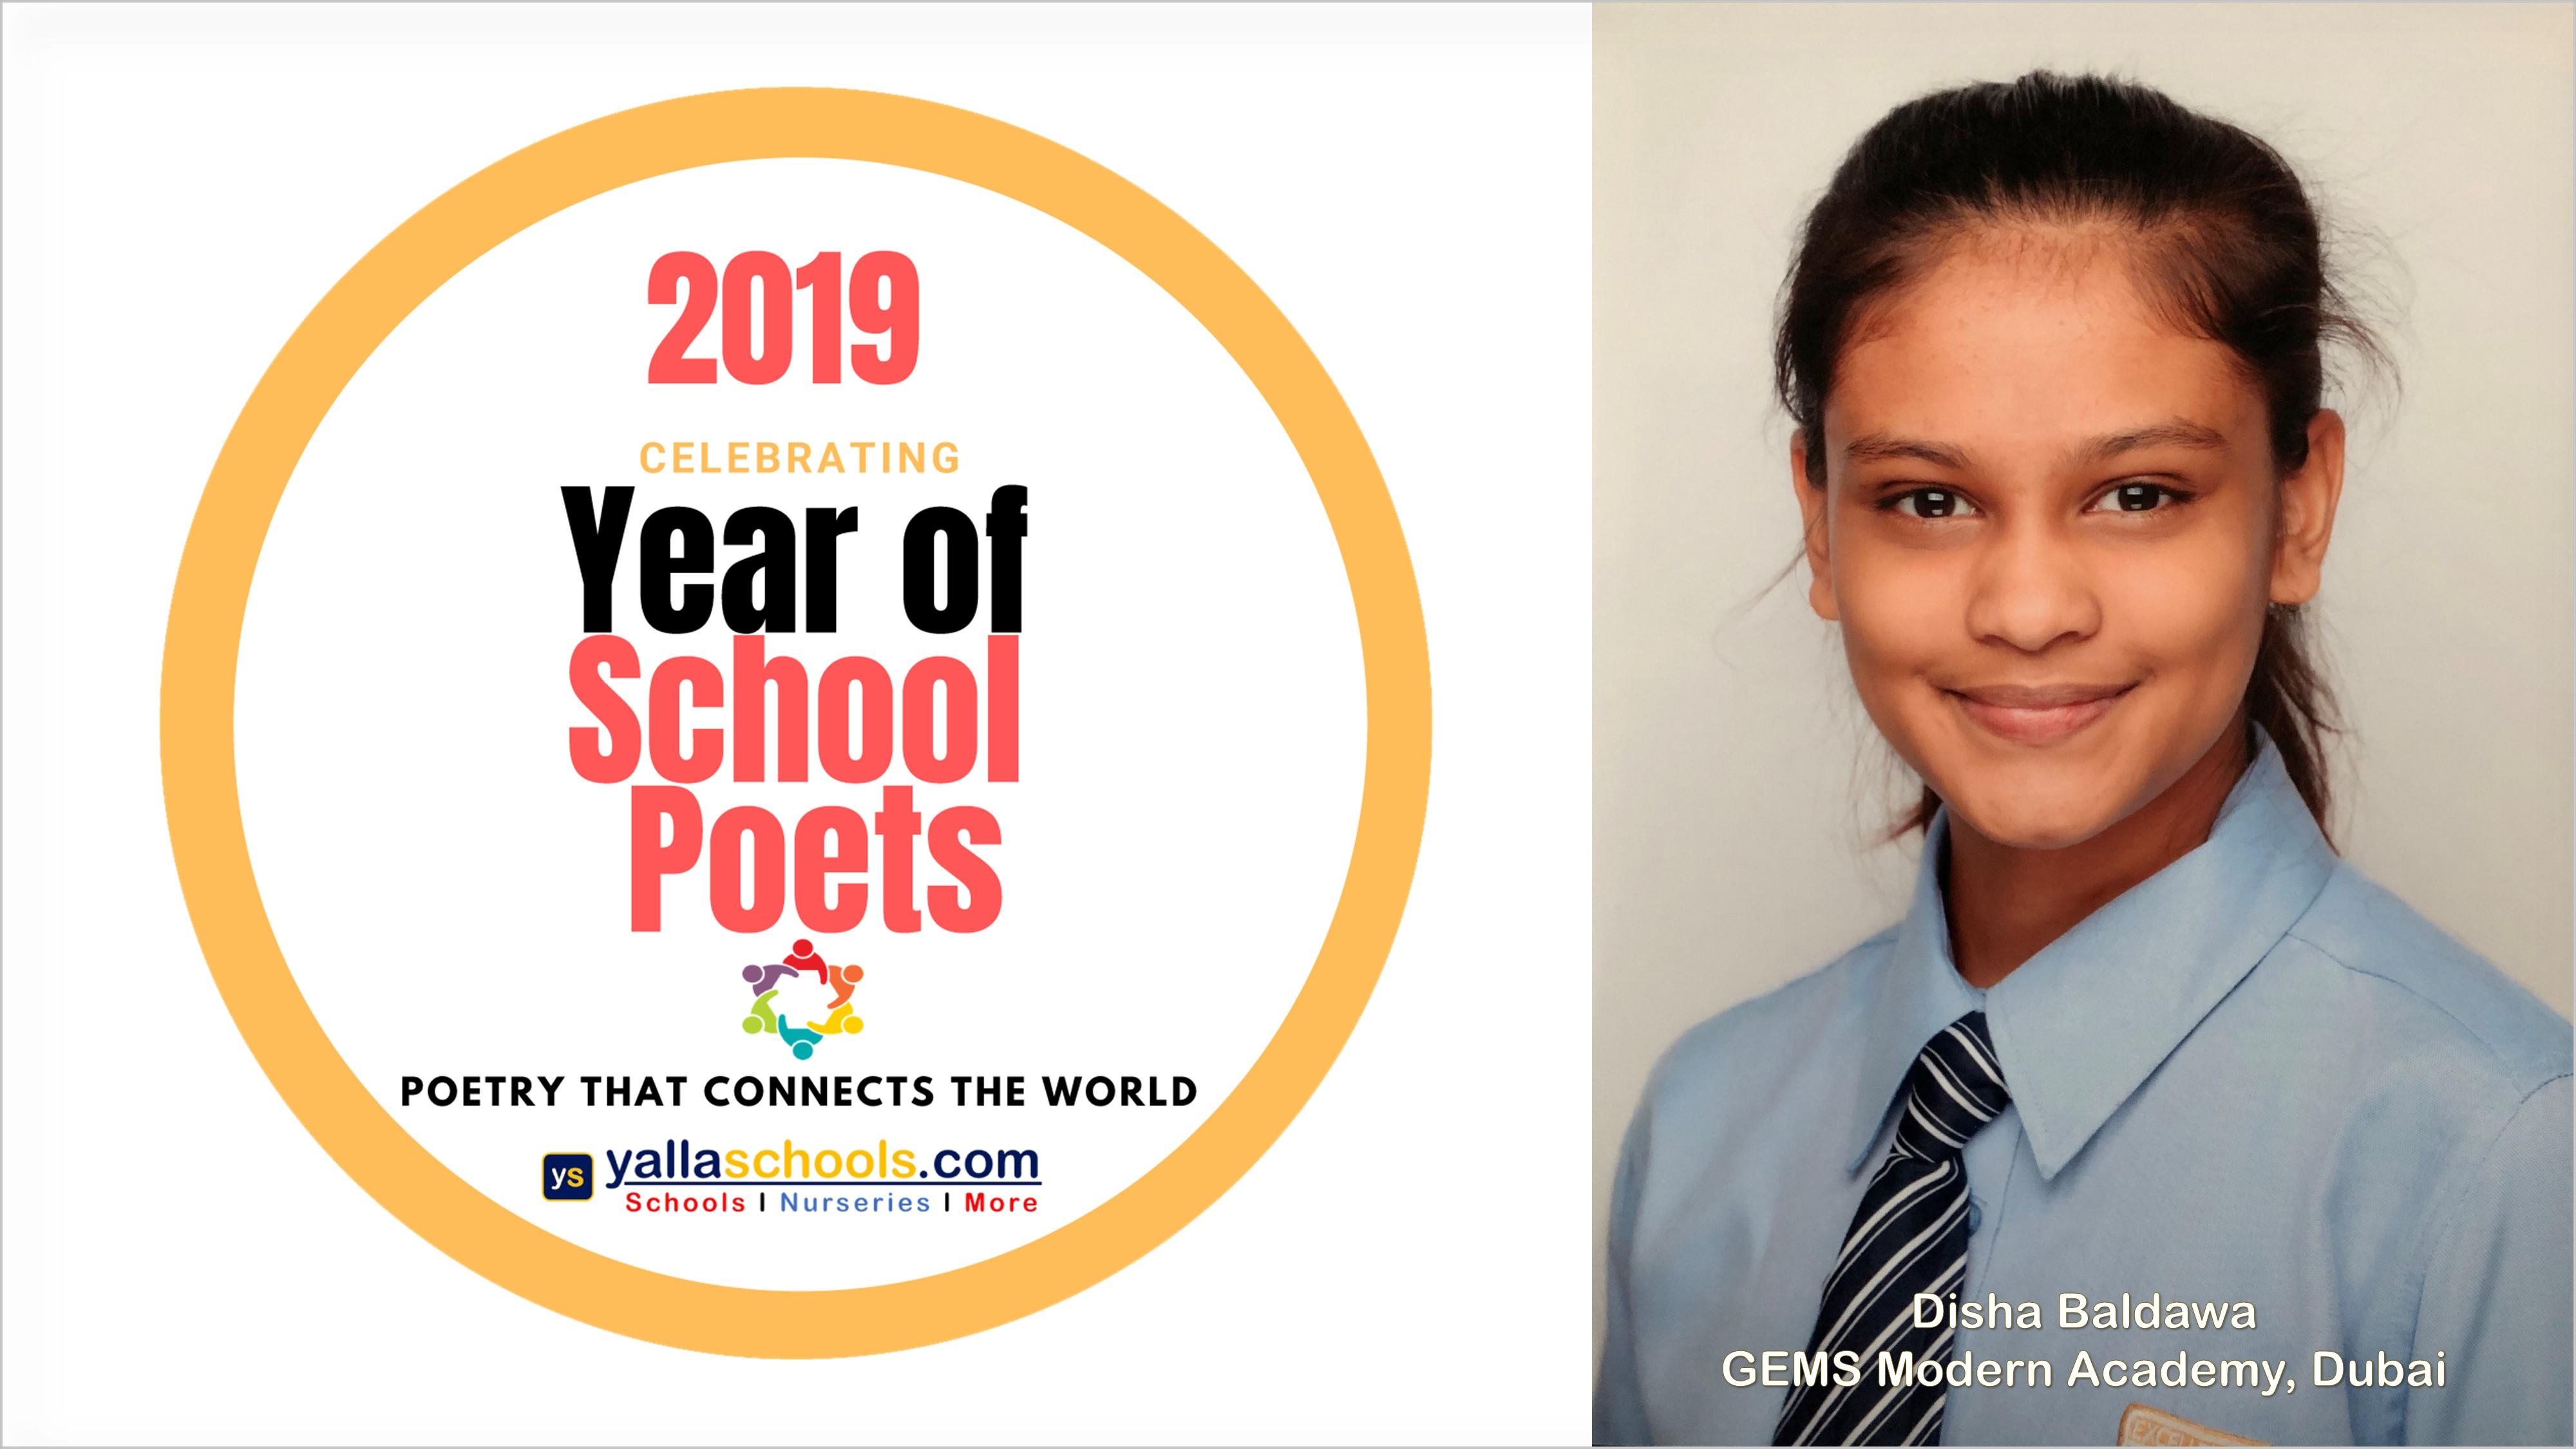 2019_Year_of_School_Poets,Disha_Baldawa,_GEMS_Modern_Academy,_Dubai